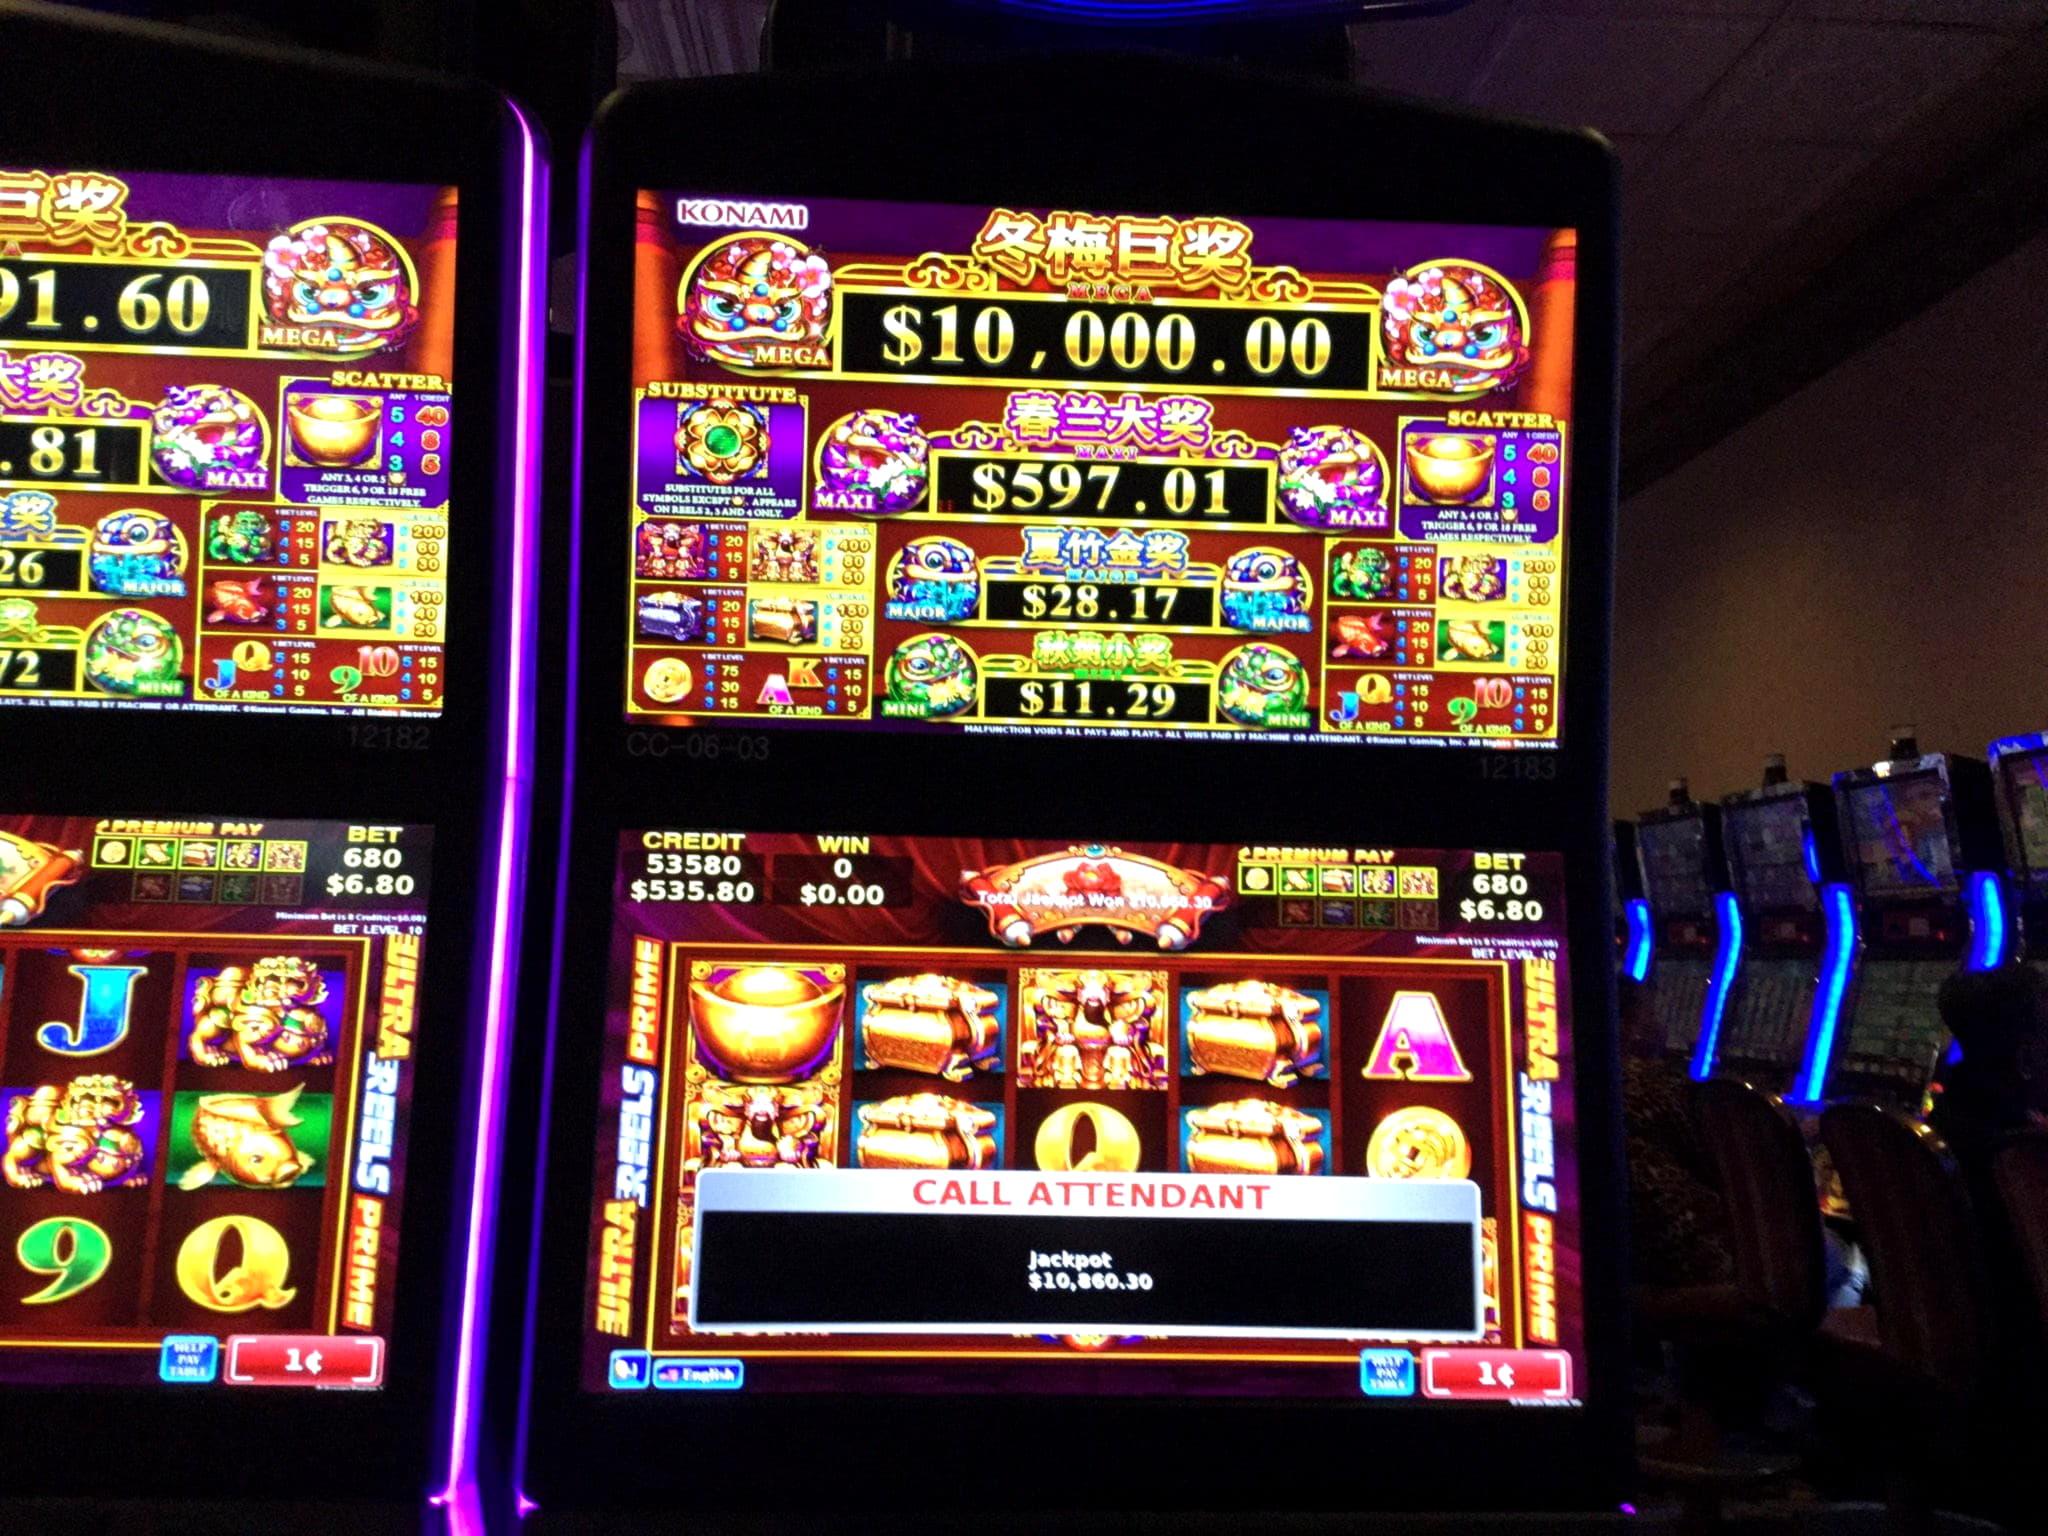 260 free spins no deposit casino at Boa Boa Casino